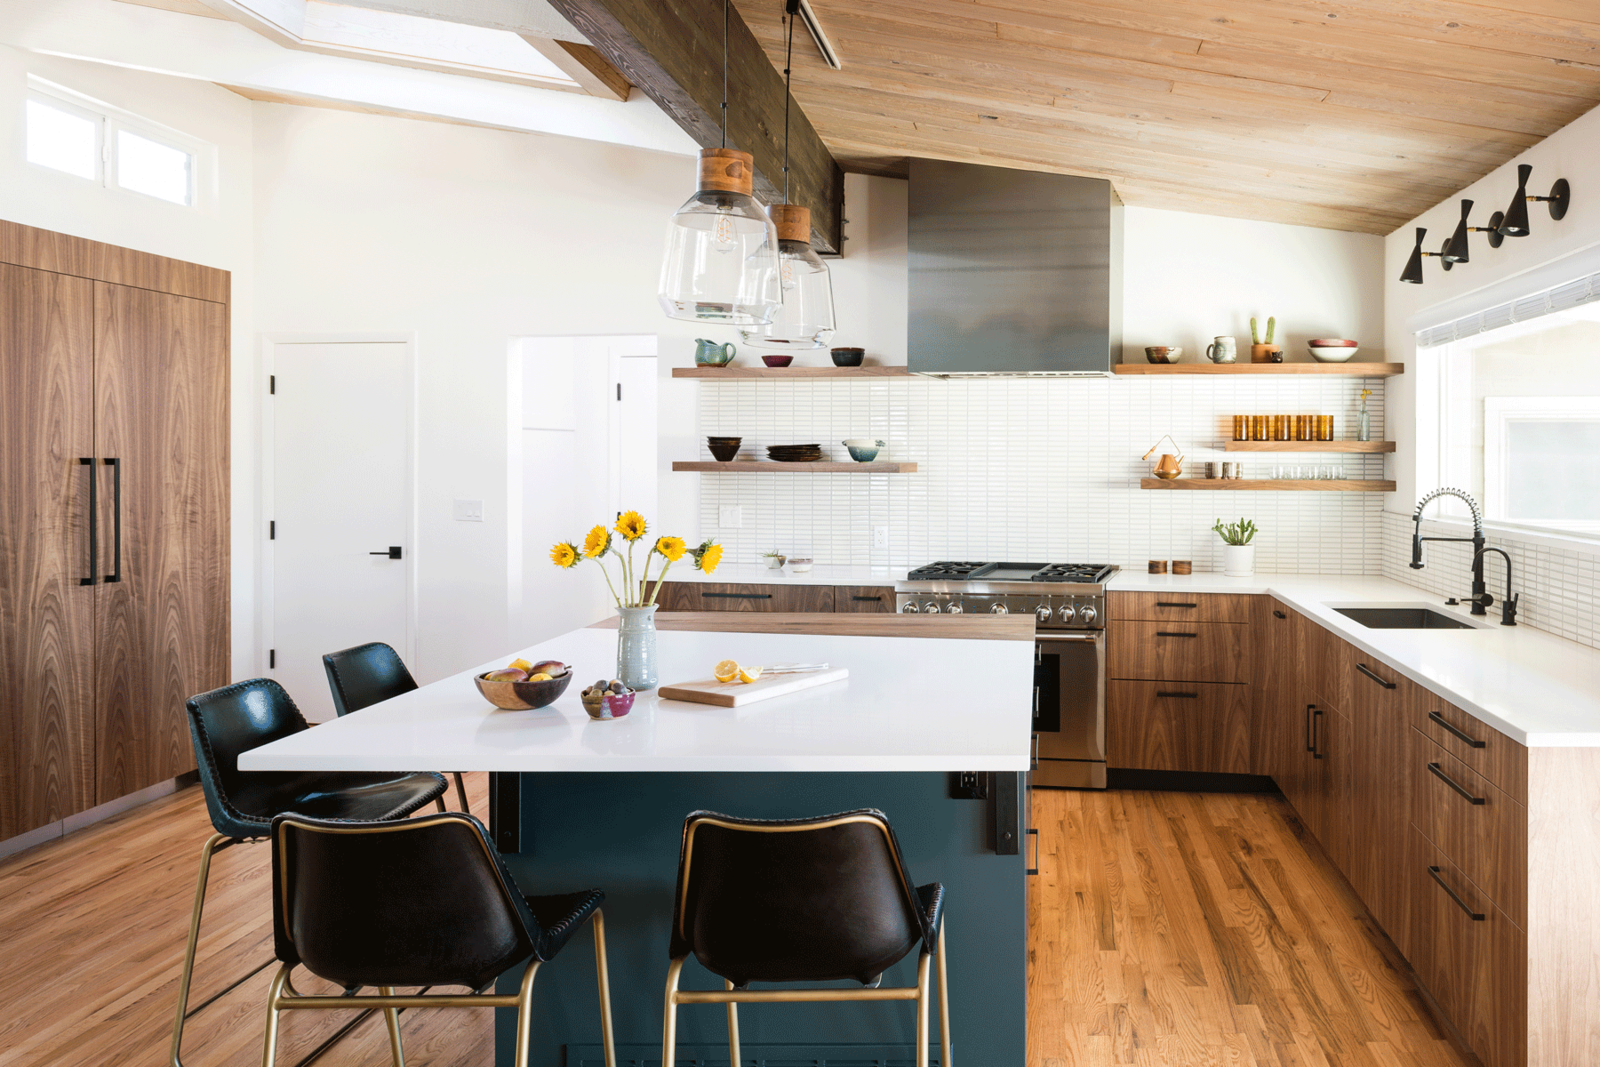 Boulder Kitchen   Wood kitchen cabinets, Wood cabinets ...